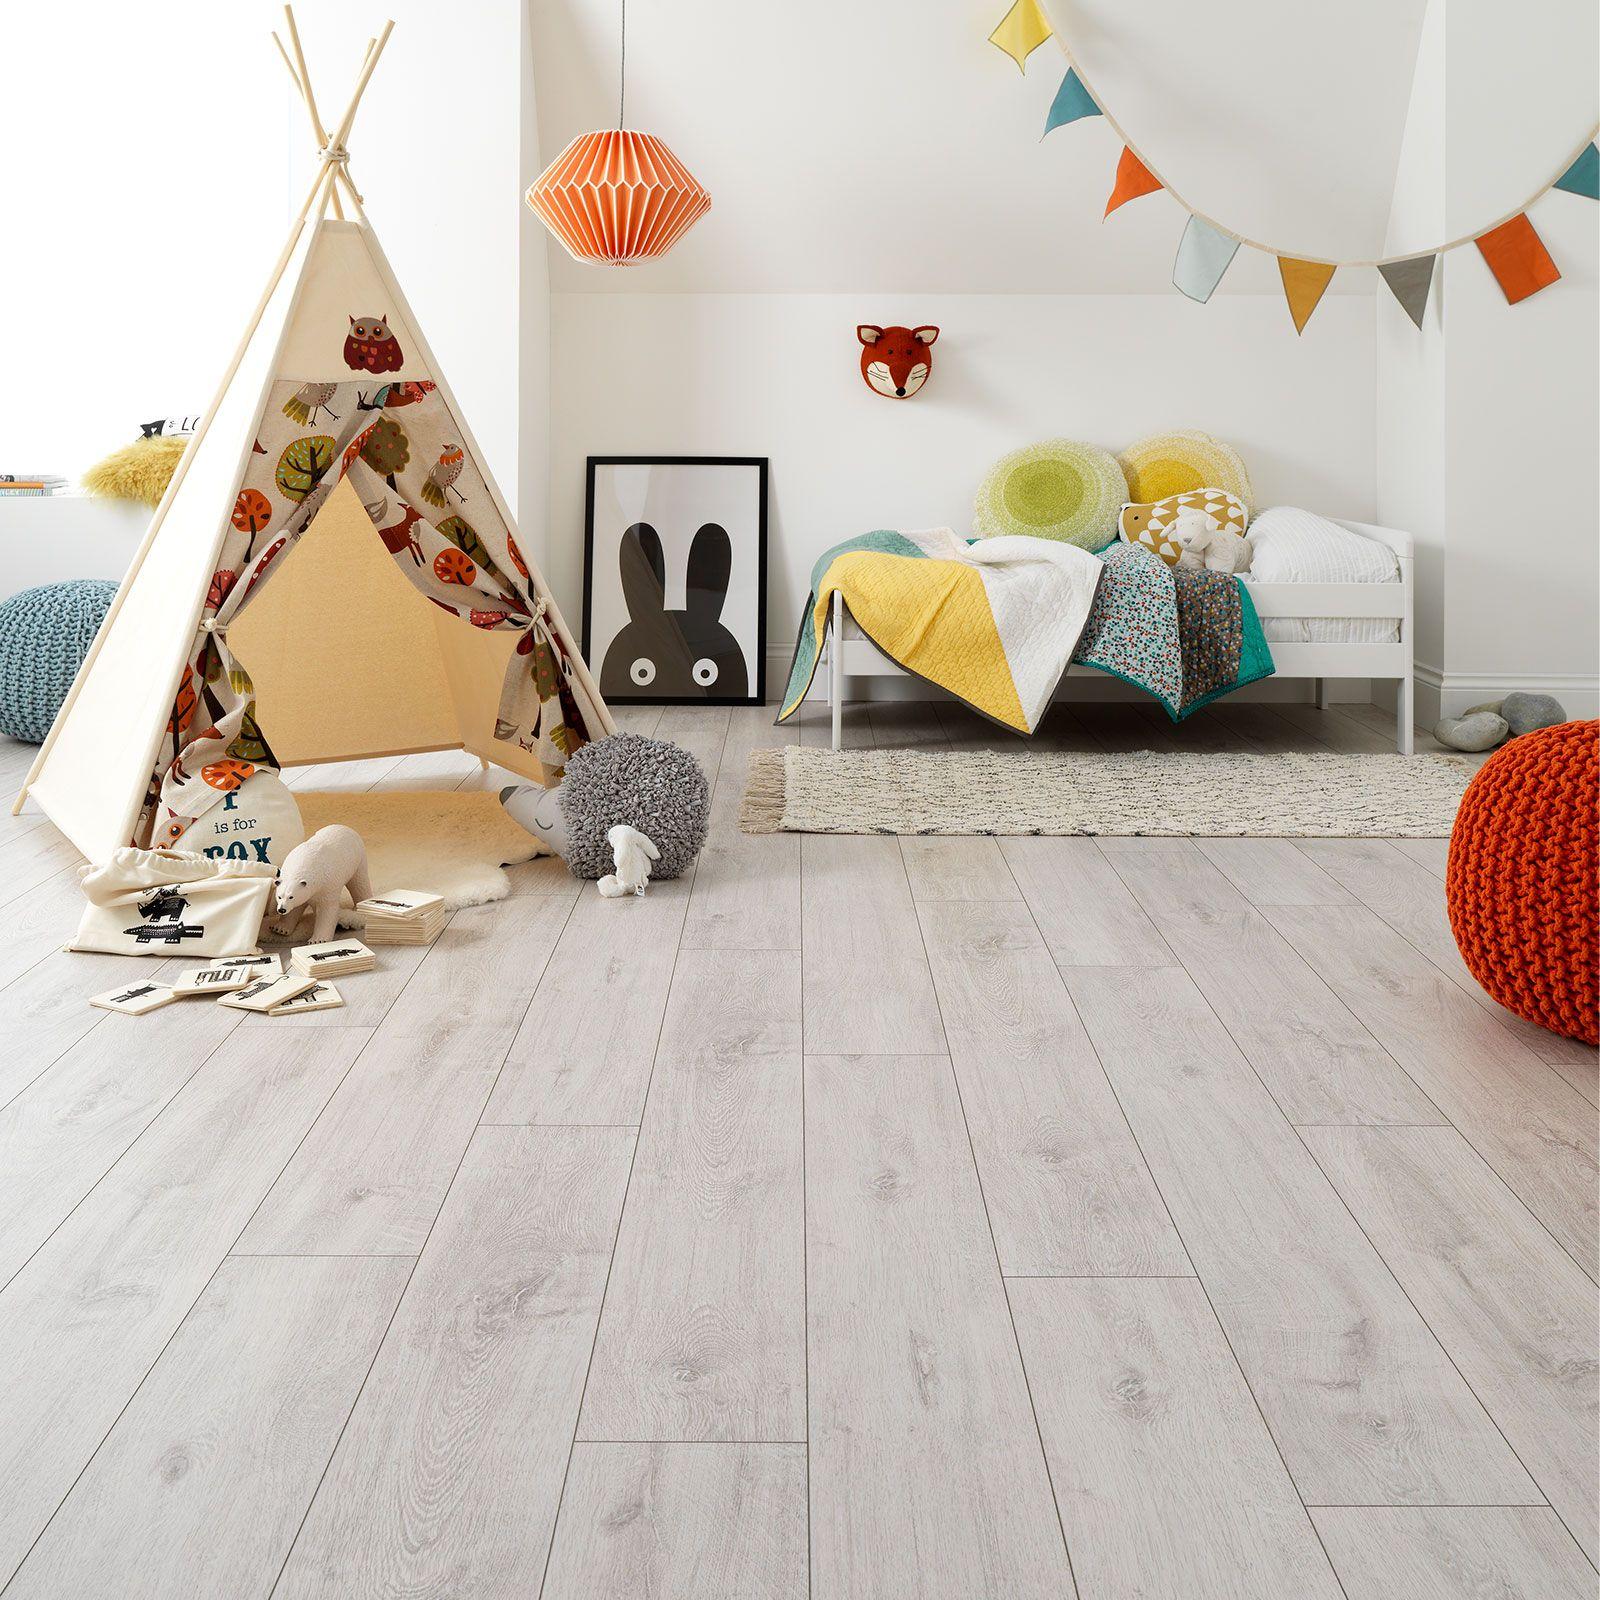 Wembury Coconut Oak | Laminate flooring, Living room flooring and ...